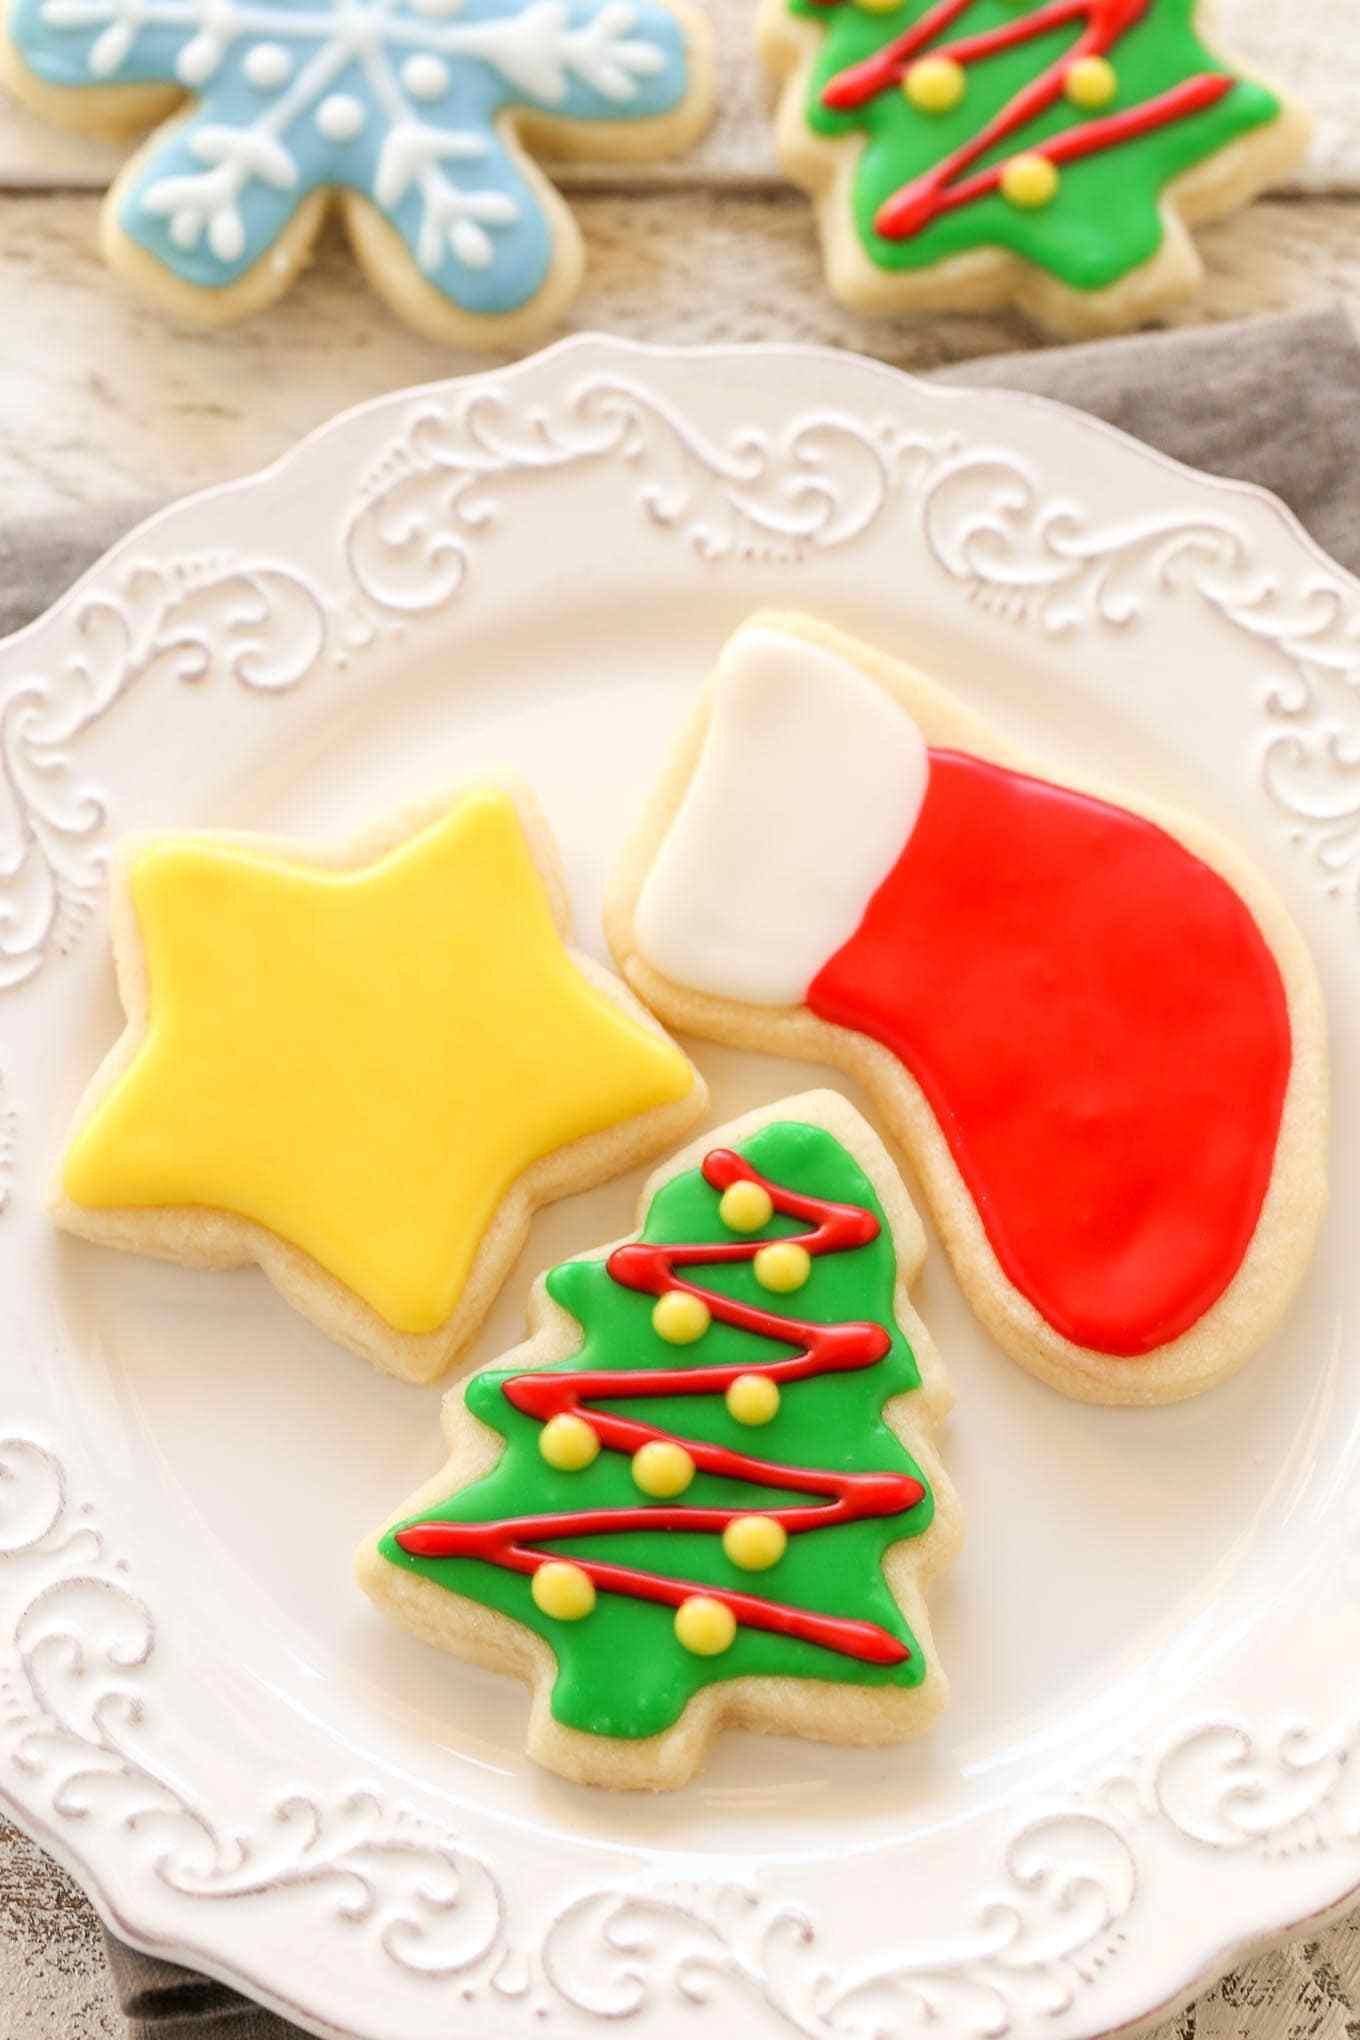 Christmas Cookies Sugar Cookies  Soft Christmas Cut Out Sugar Cookies Live Well Bake ten